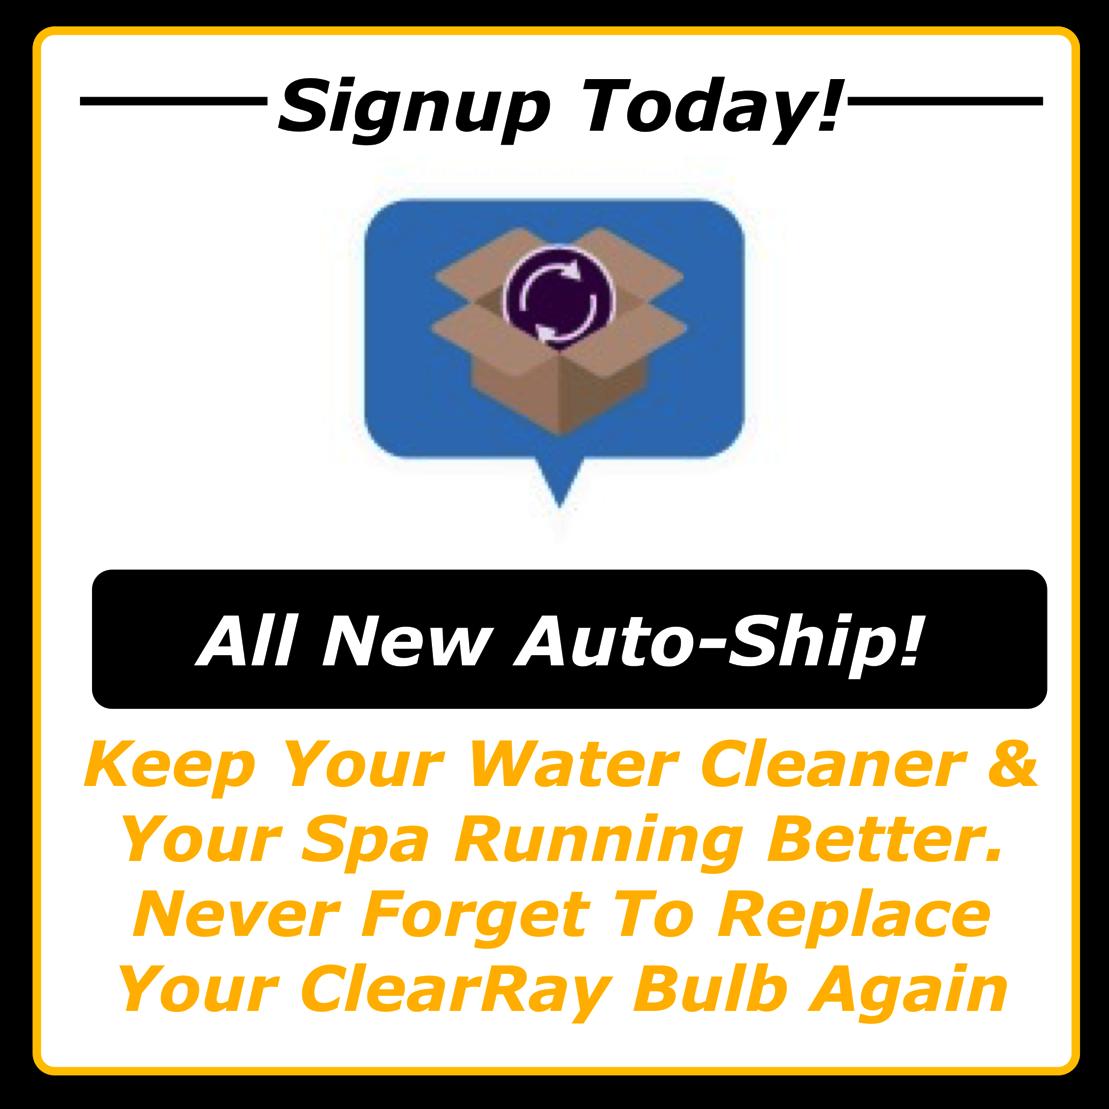 jacuzzi-sundance-clearray-bulb-6472-857-auto-ship.png